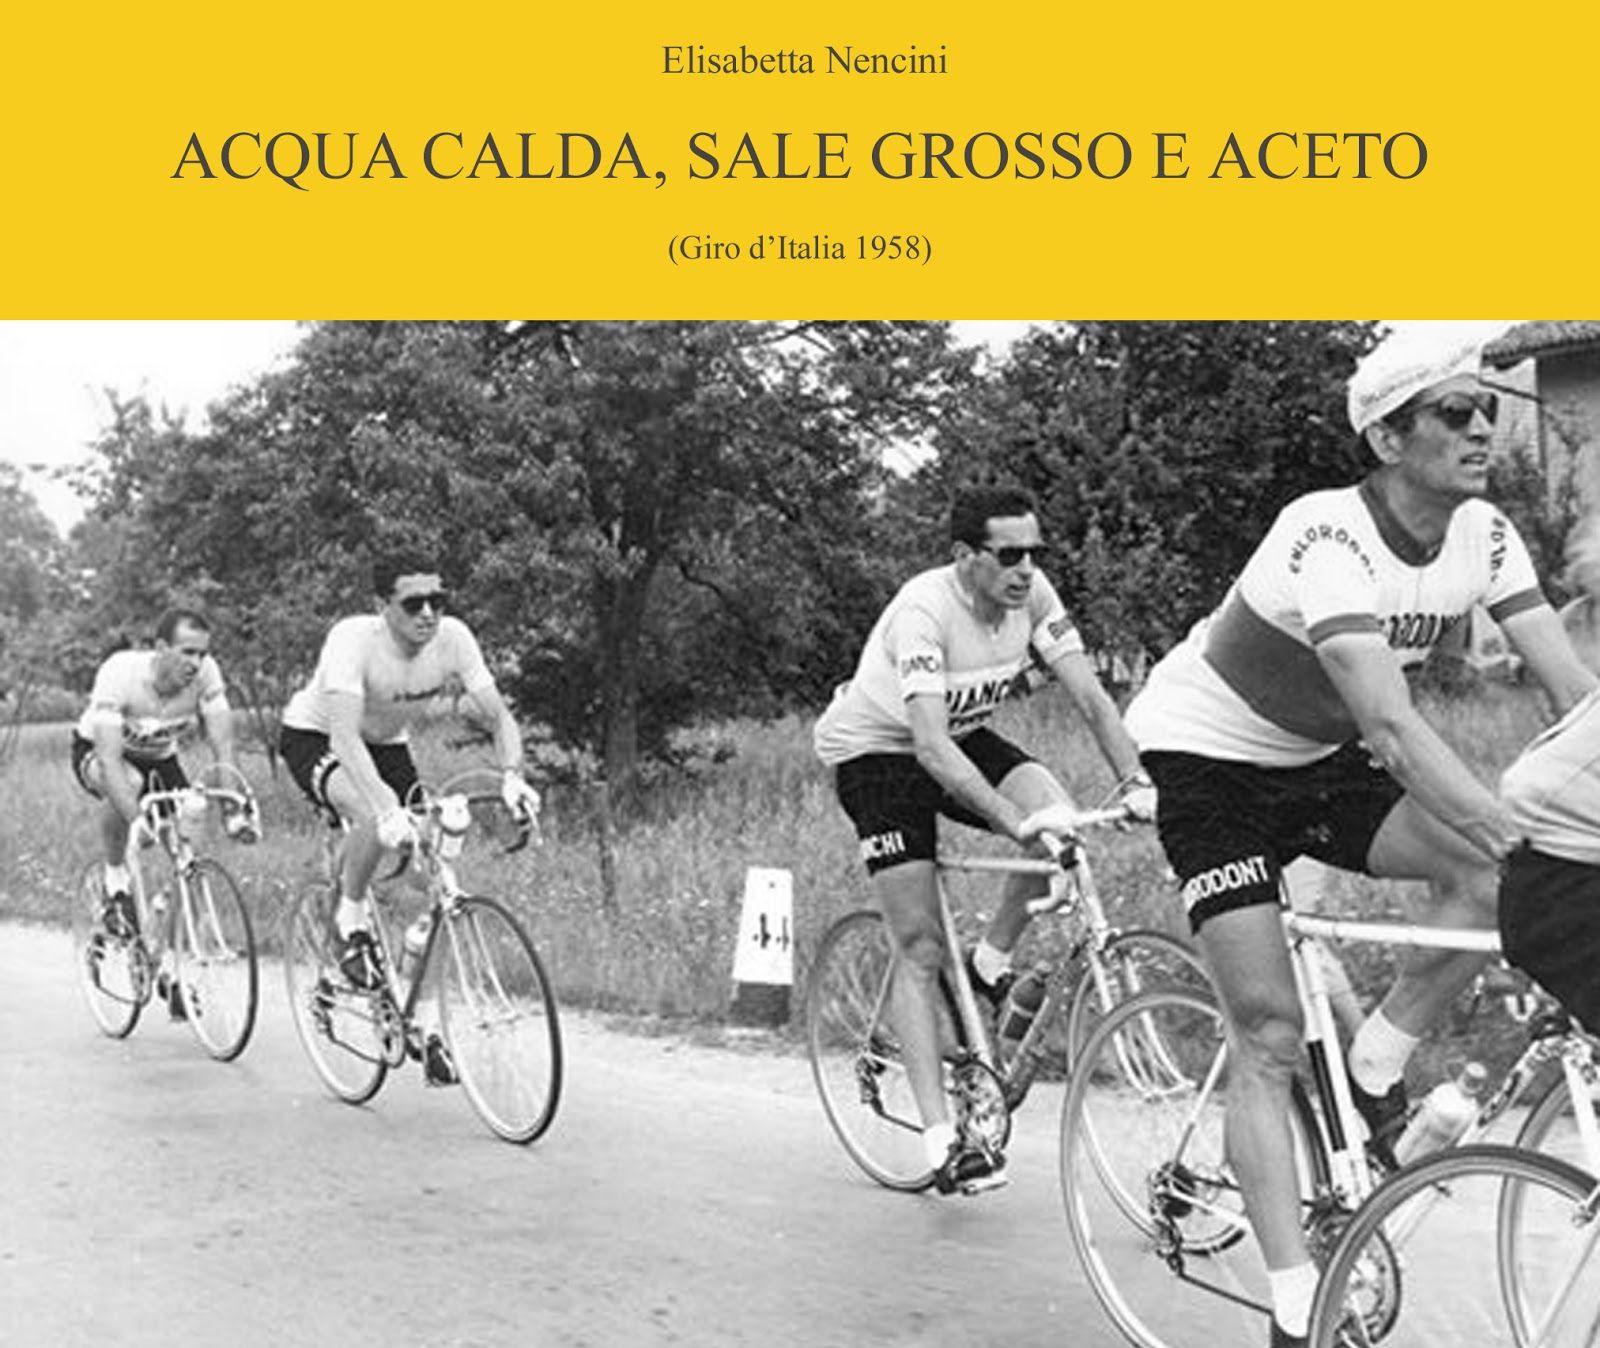 ACQUA CALDA, SALE GROSSO E ACETO Salute, Acqua, Aceto